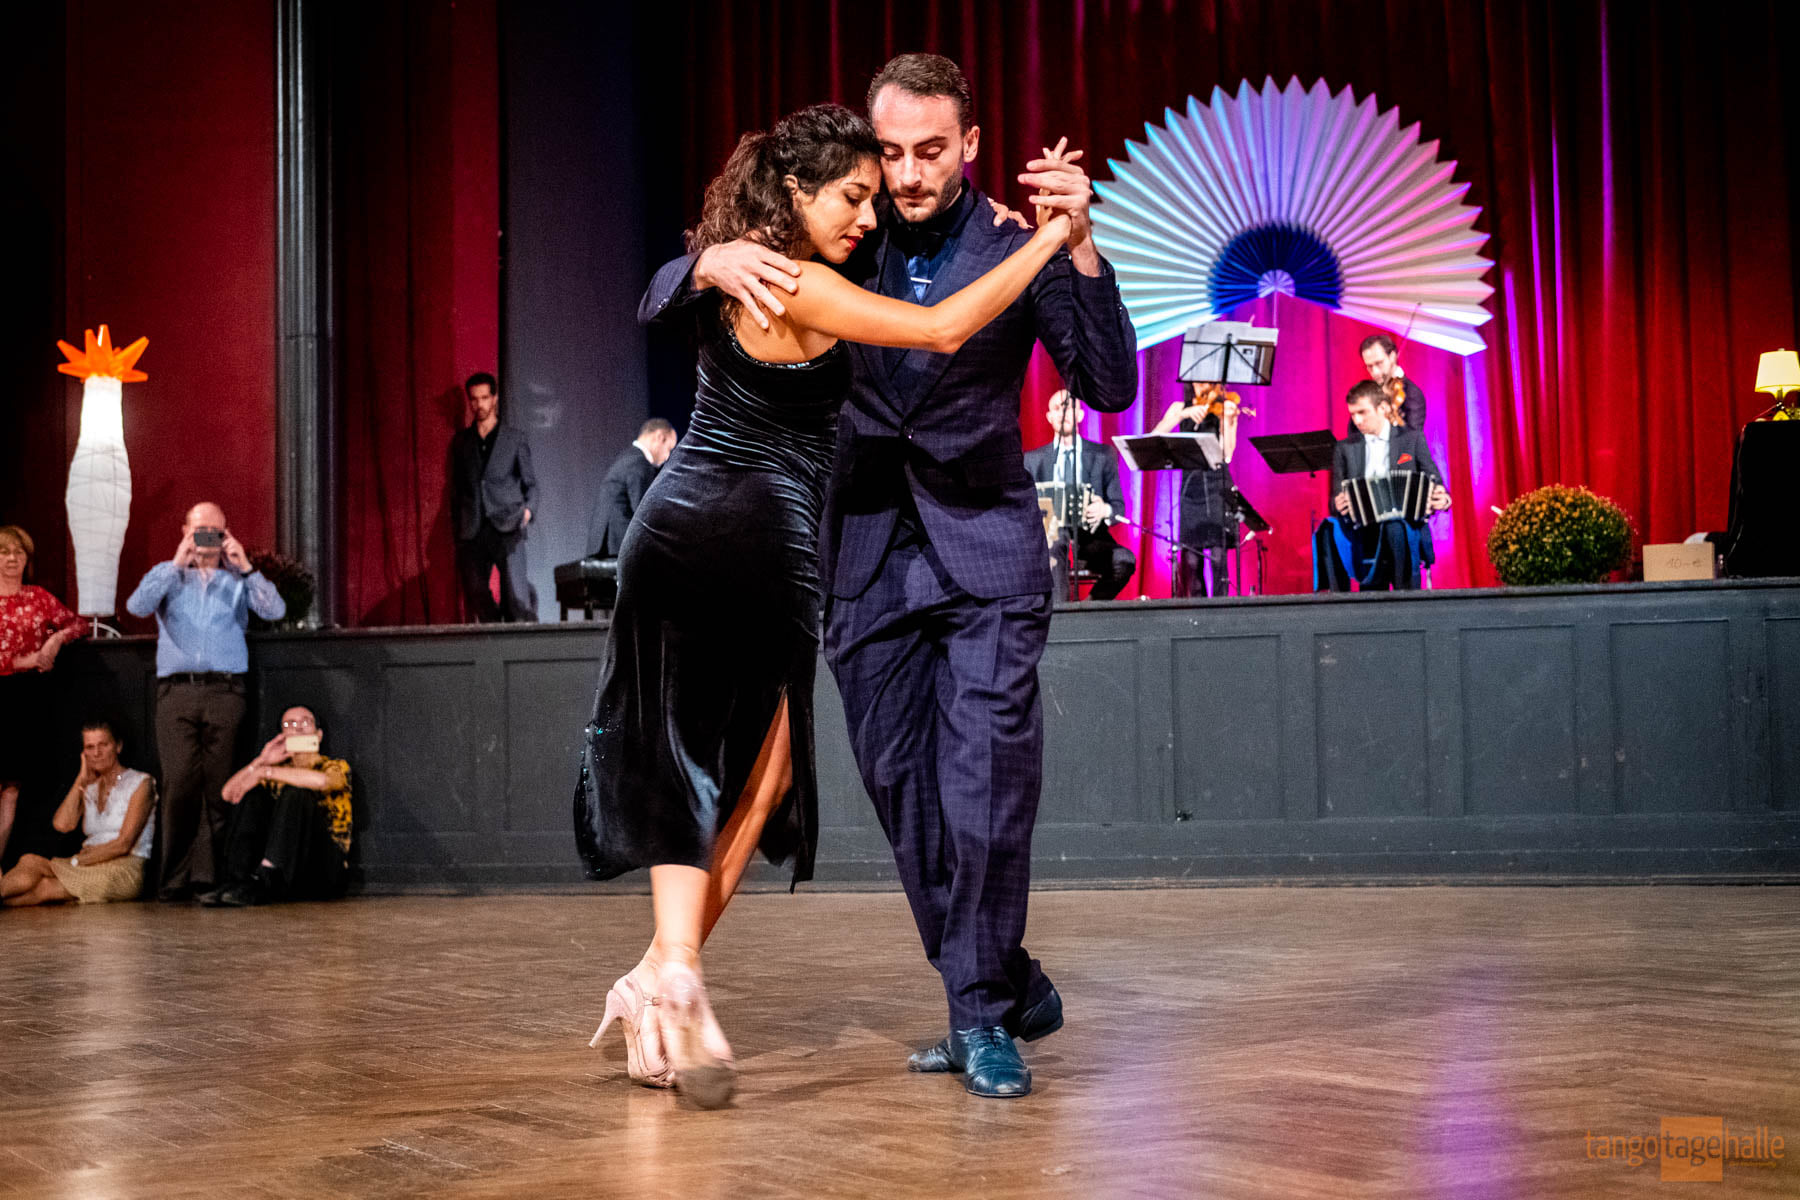 Lorena Tarantino & Gianpiero Galdi, 18. TangoTageHalle 2021, Halle (Saale), Germany